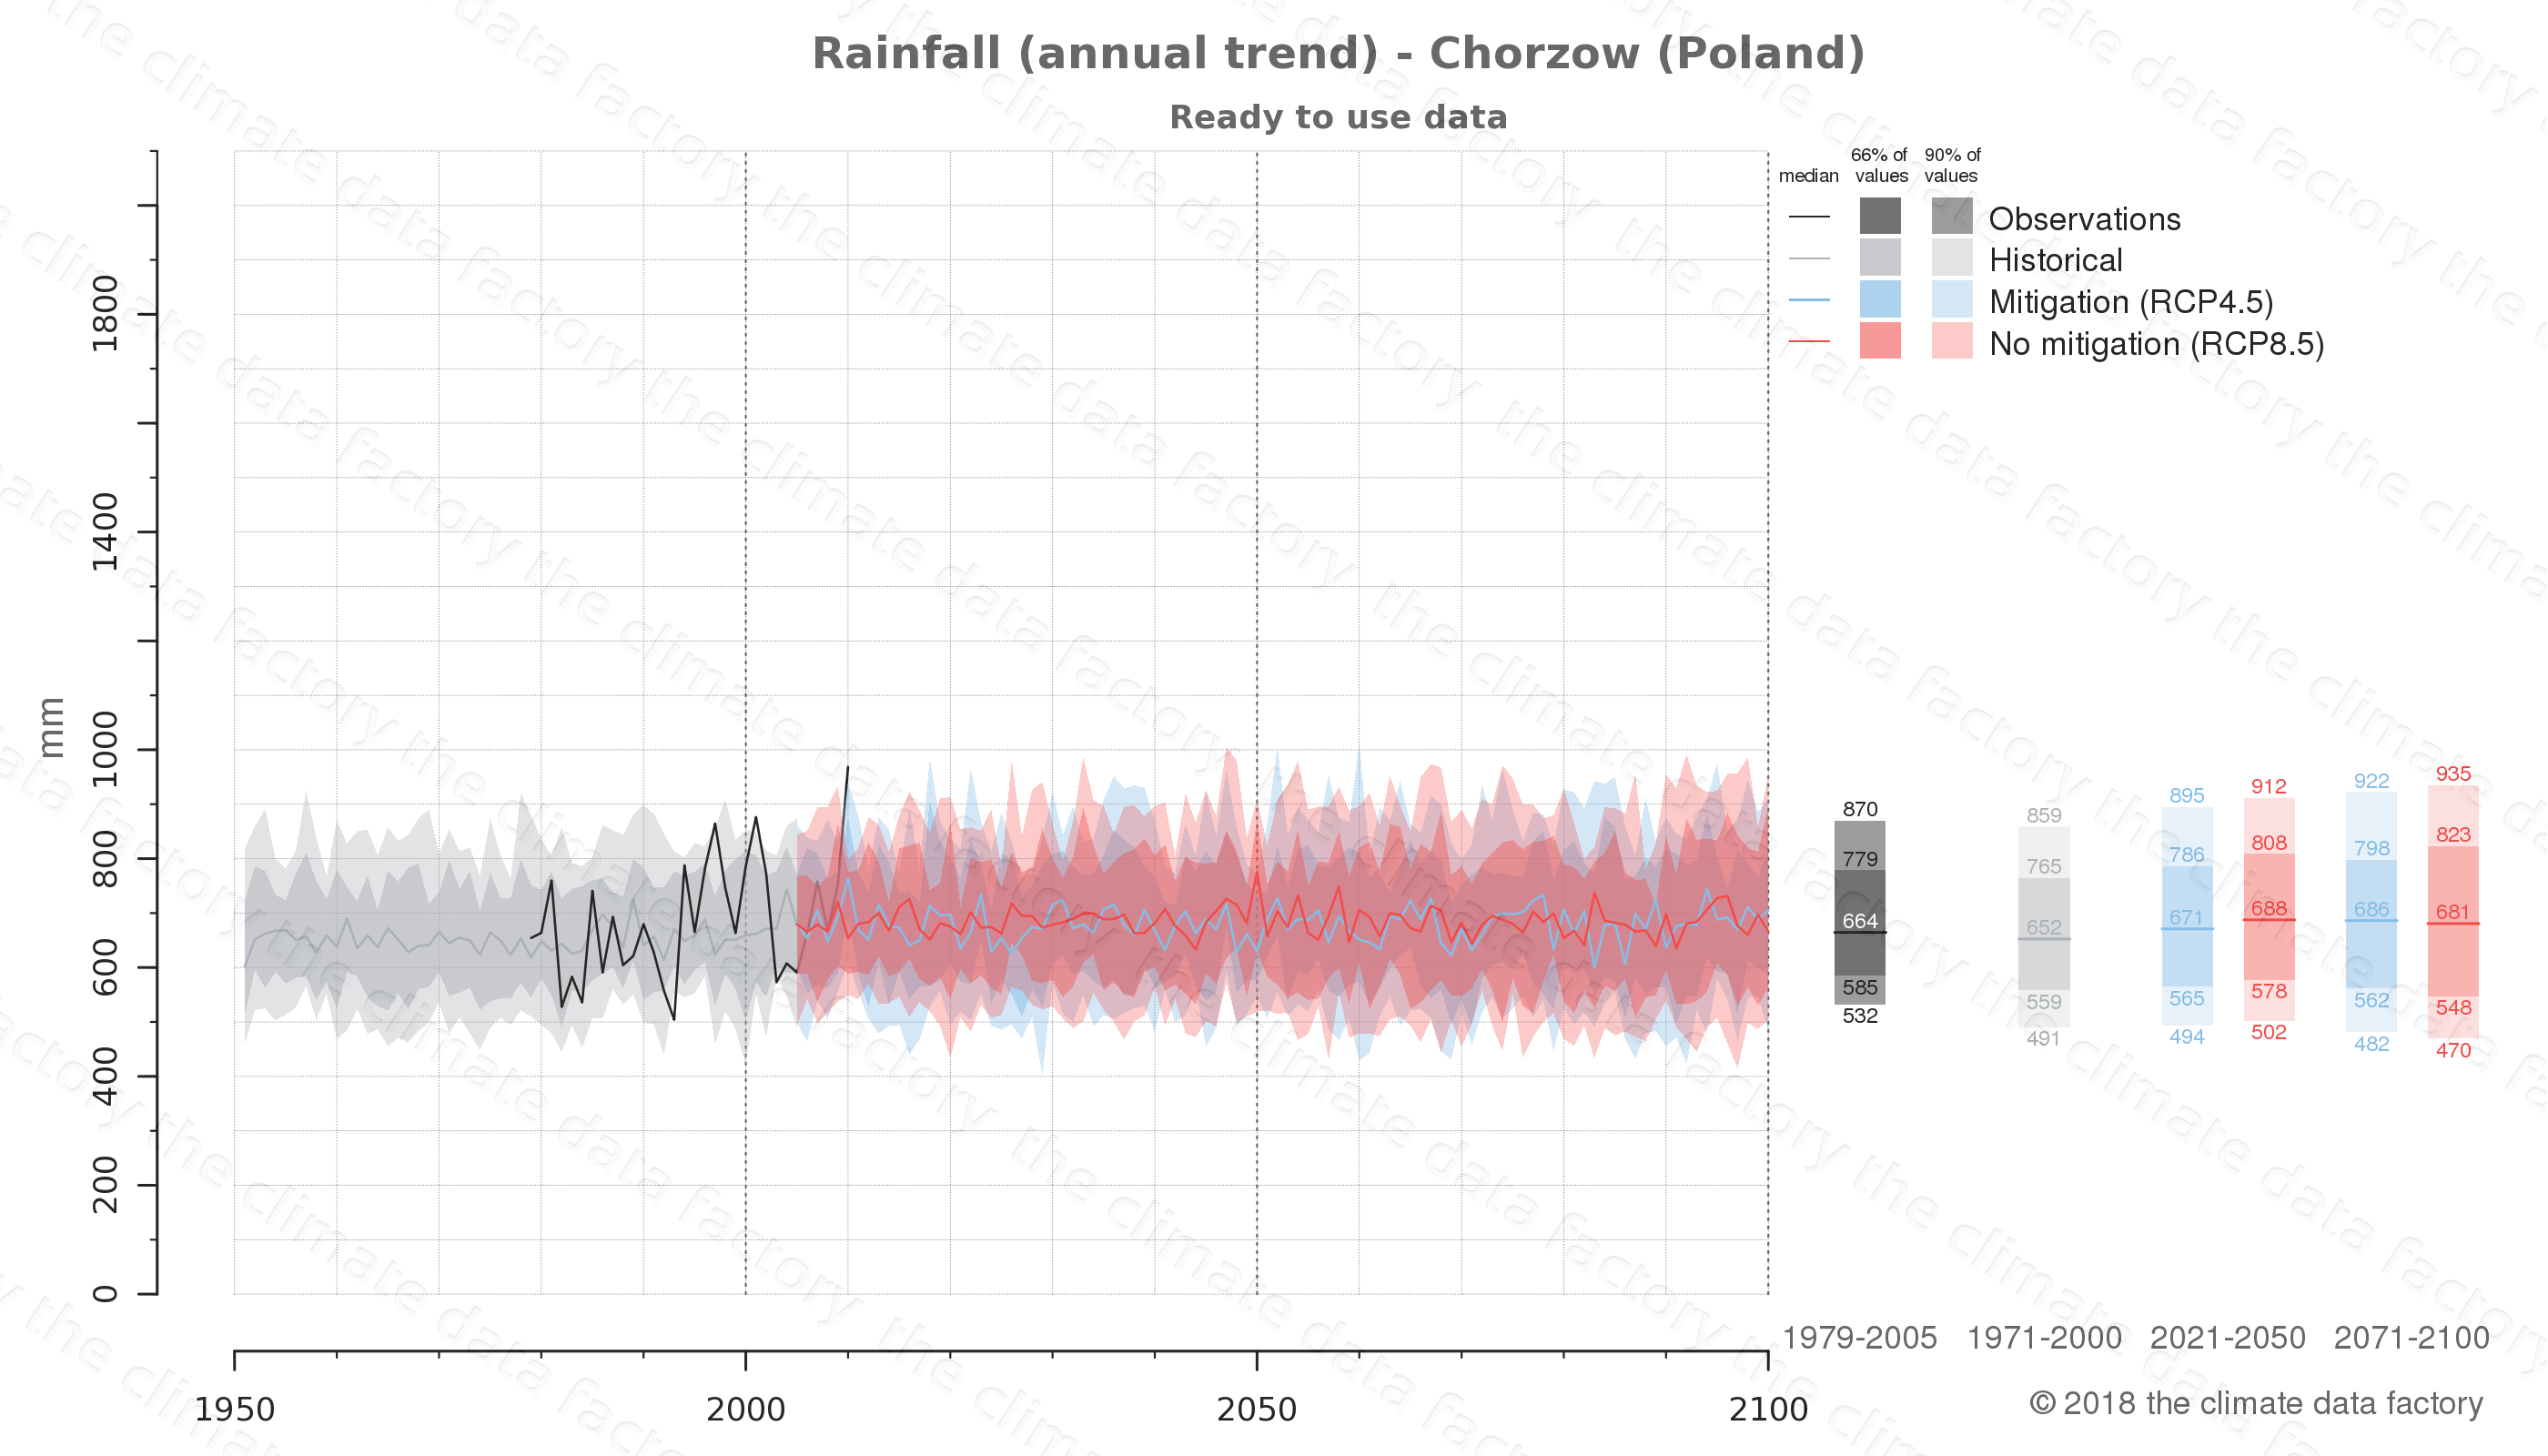 climate change data policy adaptation climate graph city data rainfall chorzow poland